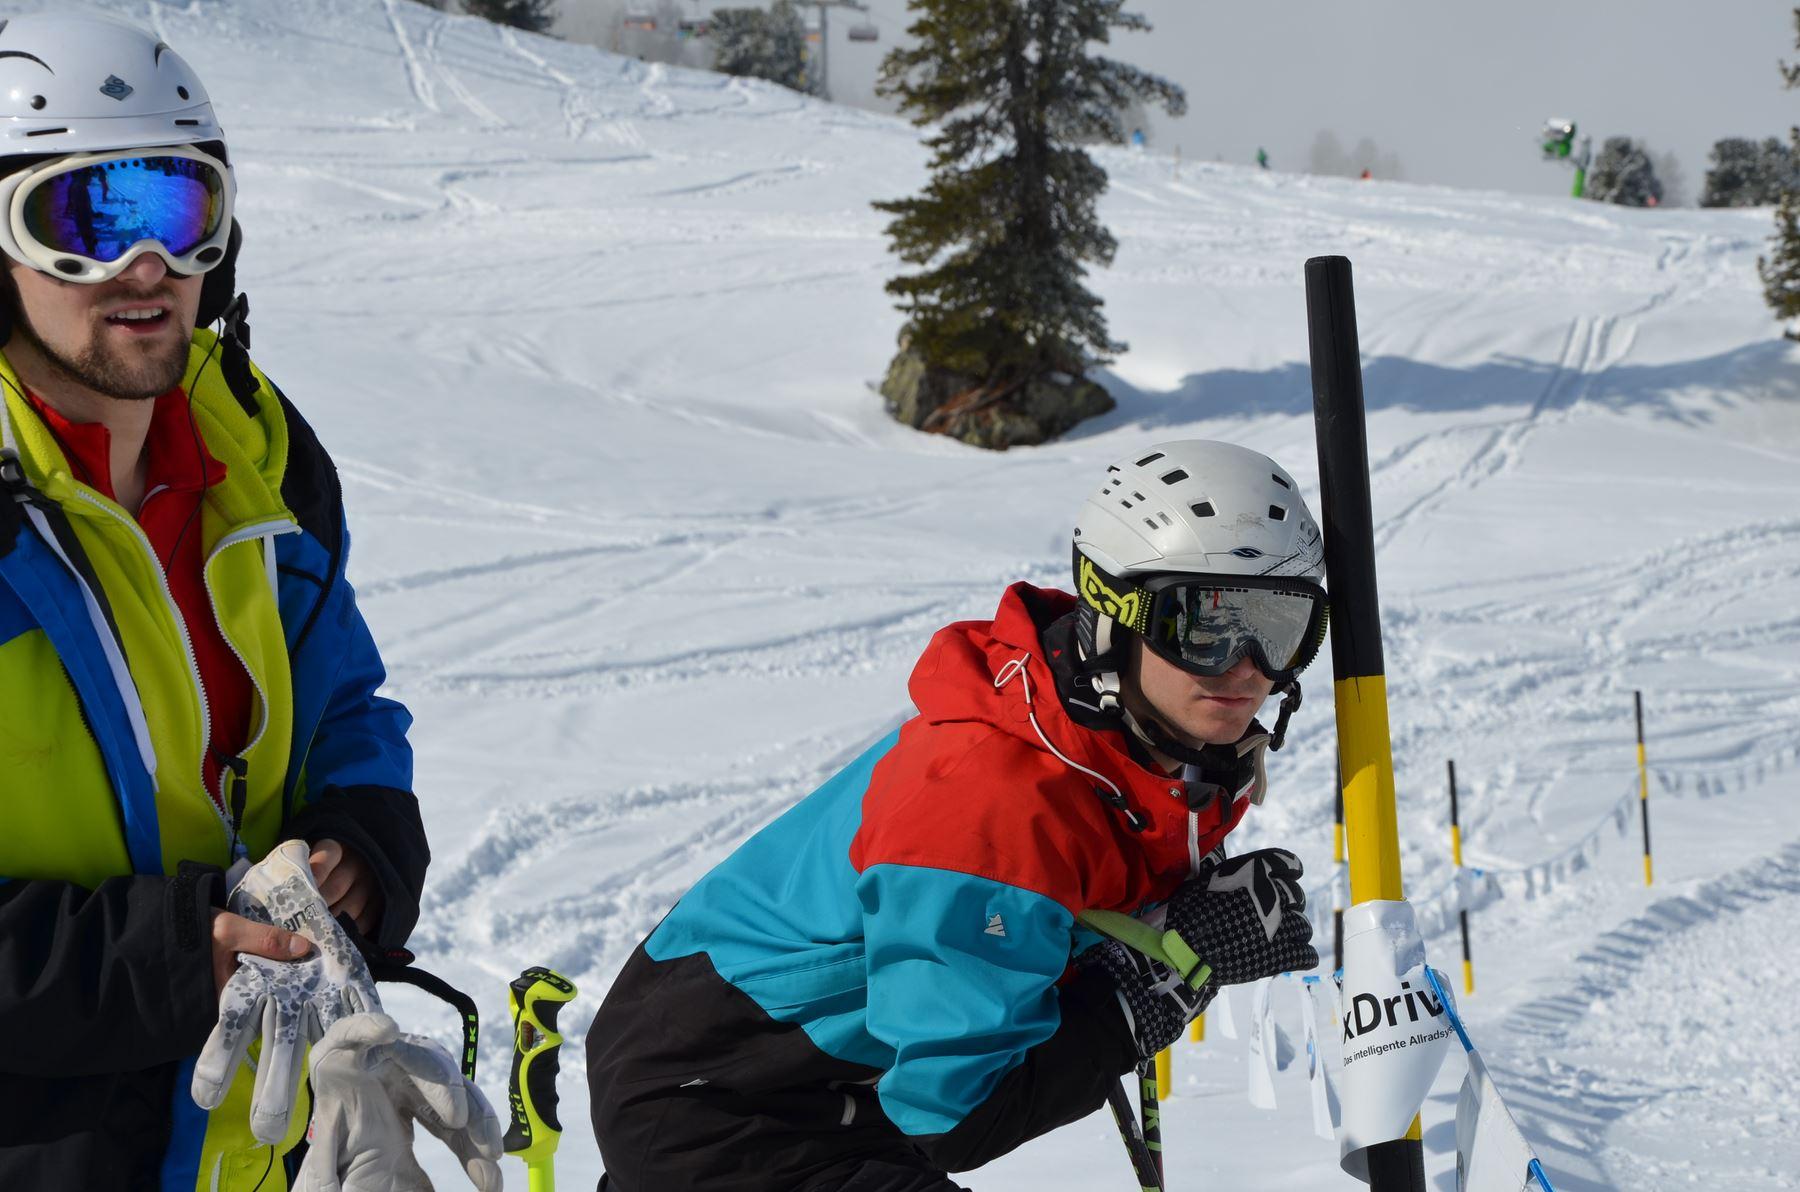 2015-03-22 BV Zillertal Skirennen 123.JPG